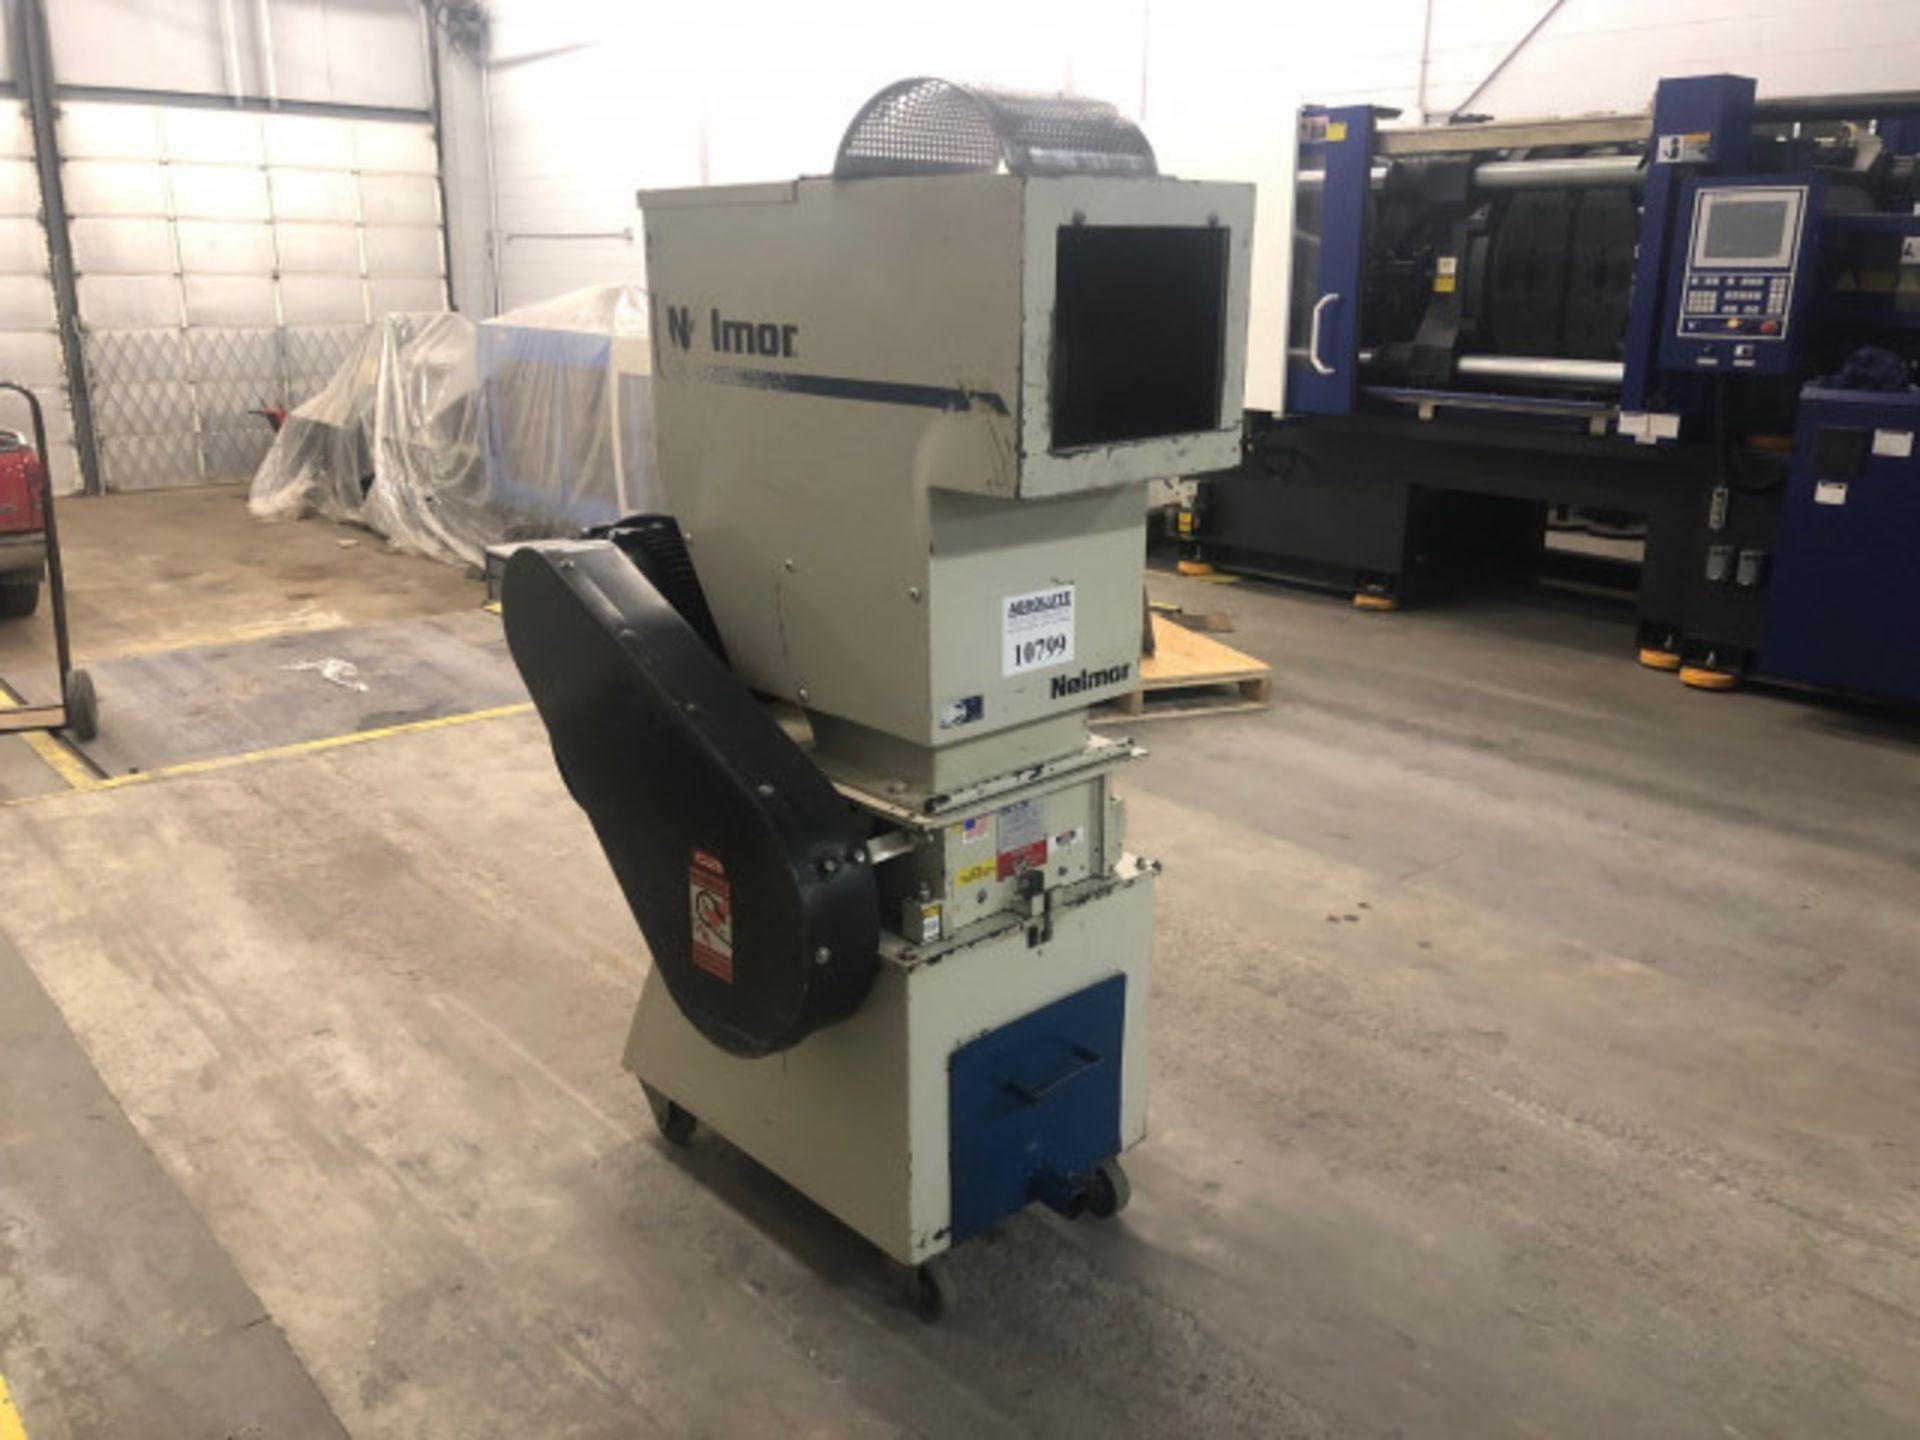 Lot 115A - 5 HP Nelmor 1012 Granulator